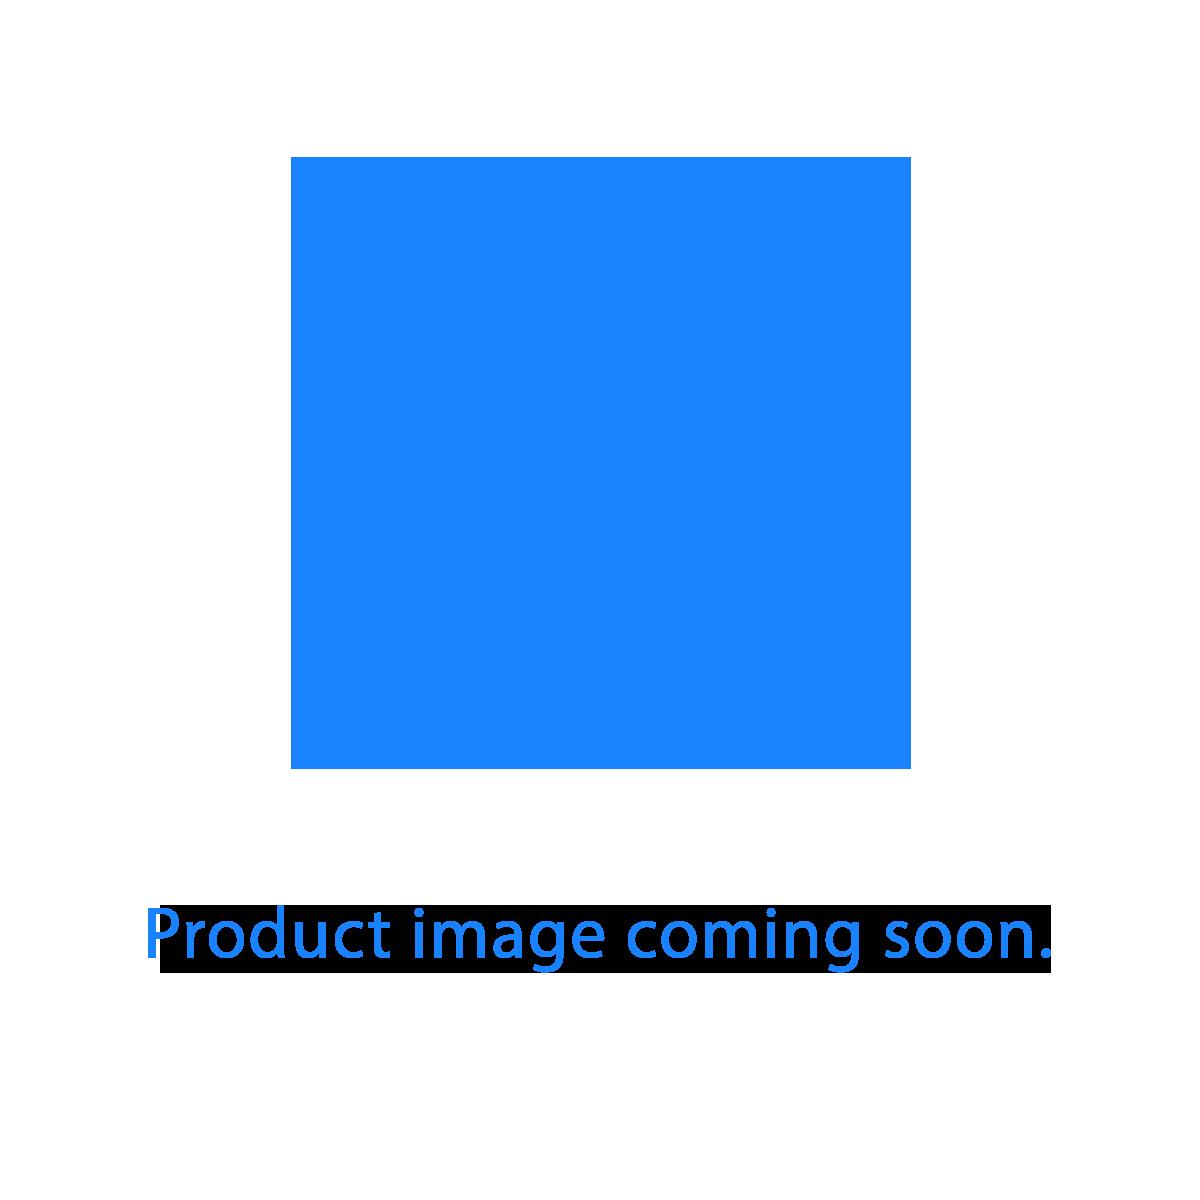 ASUS VivoBook S14 S433JQ-EB084T (Gaia Green)